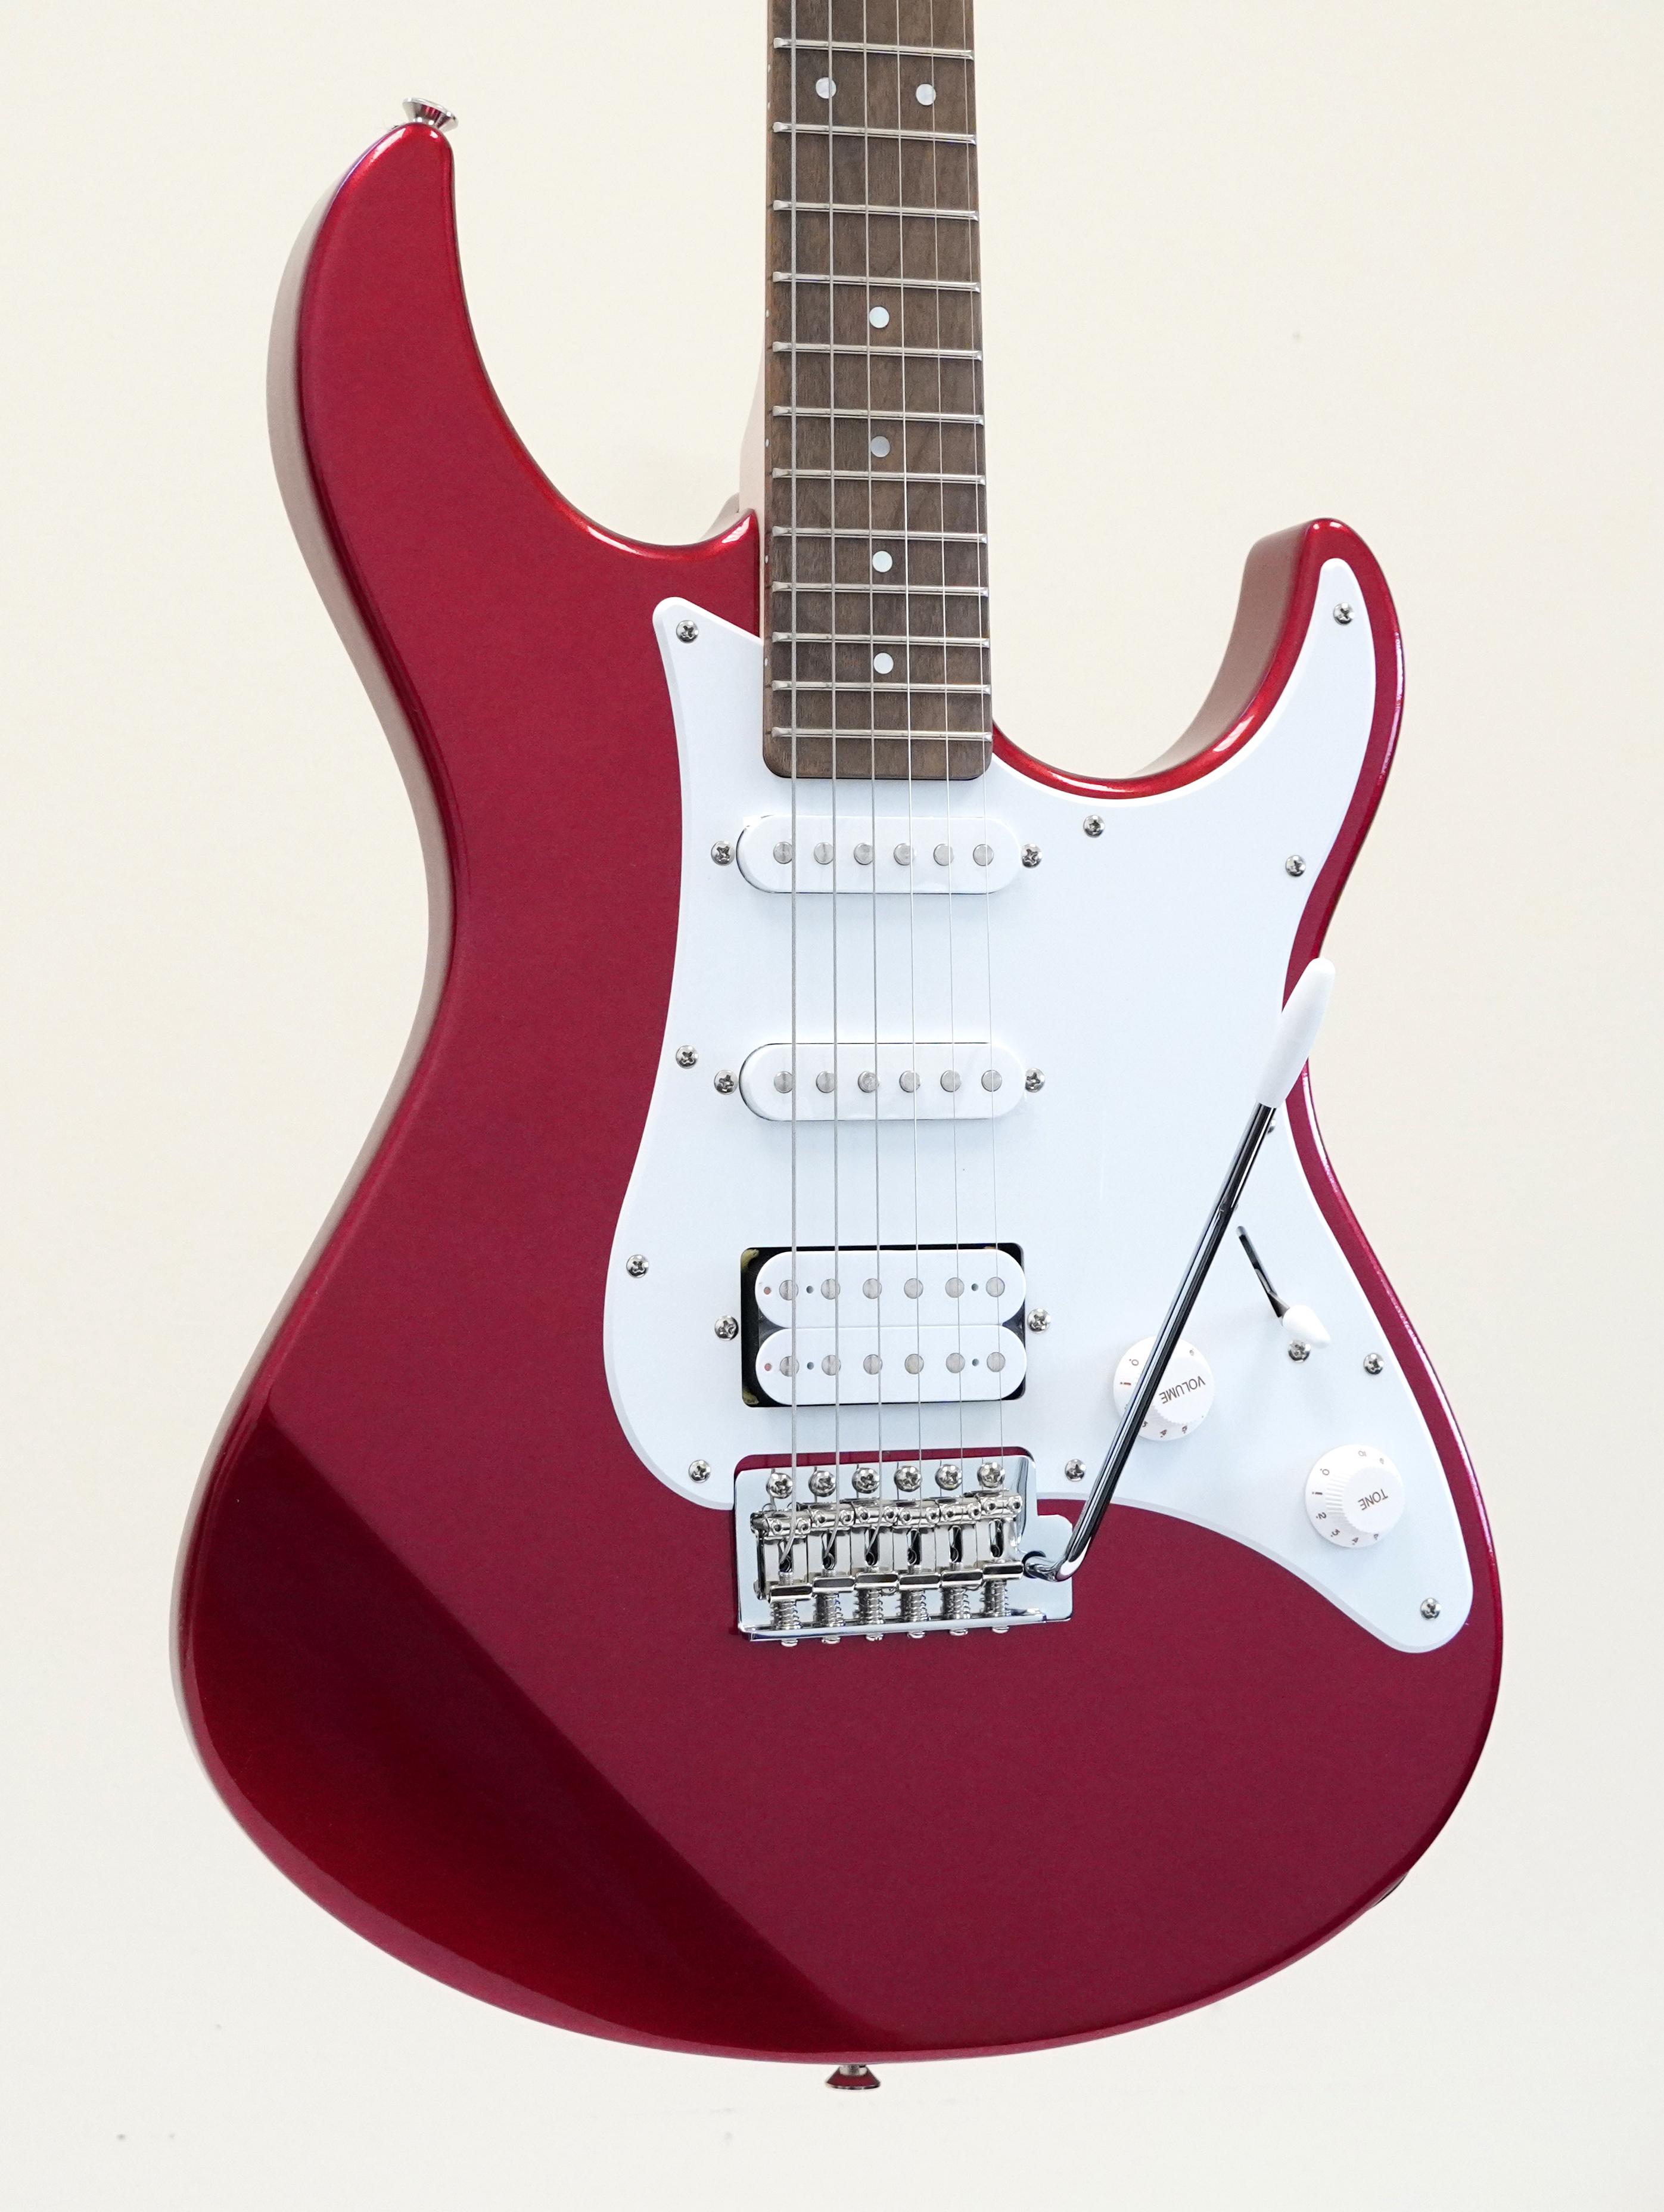 Yamaha PAC012 Pacifica Electric Guitar Metallic Red